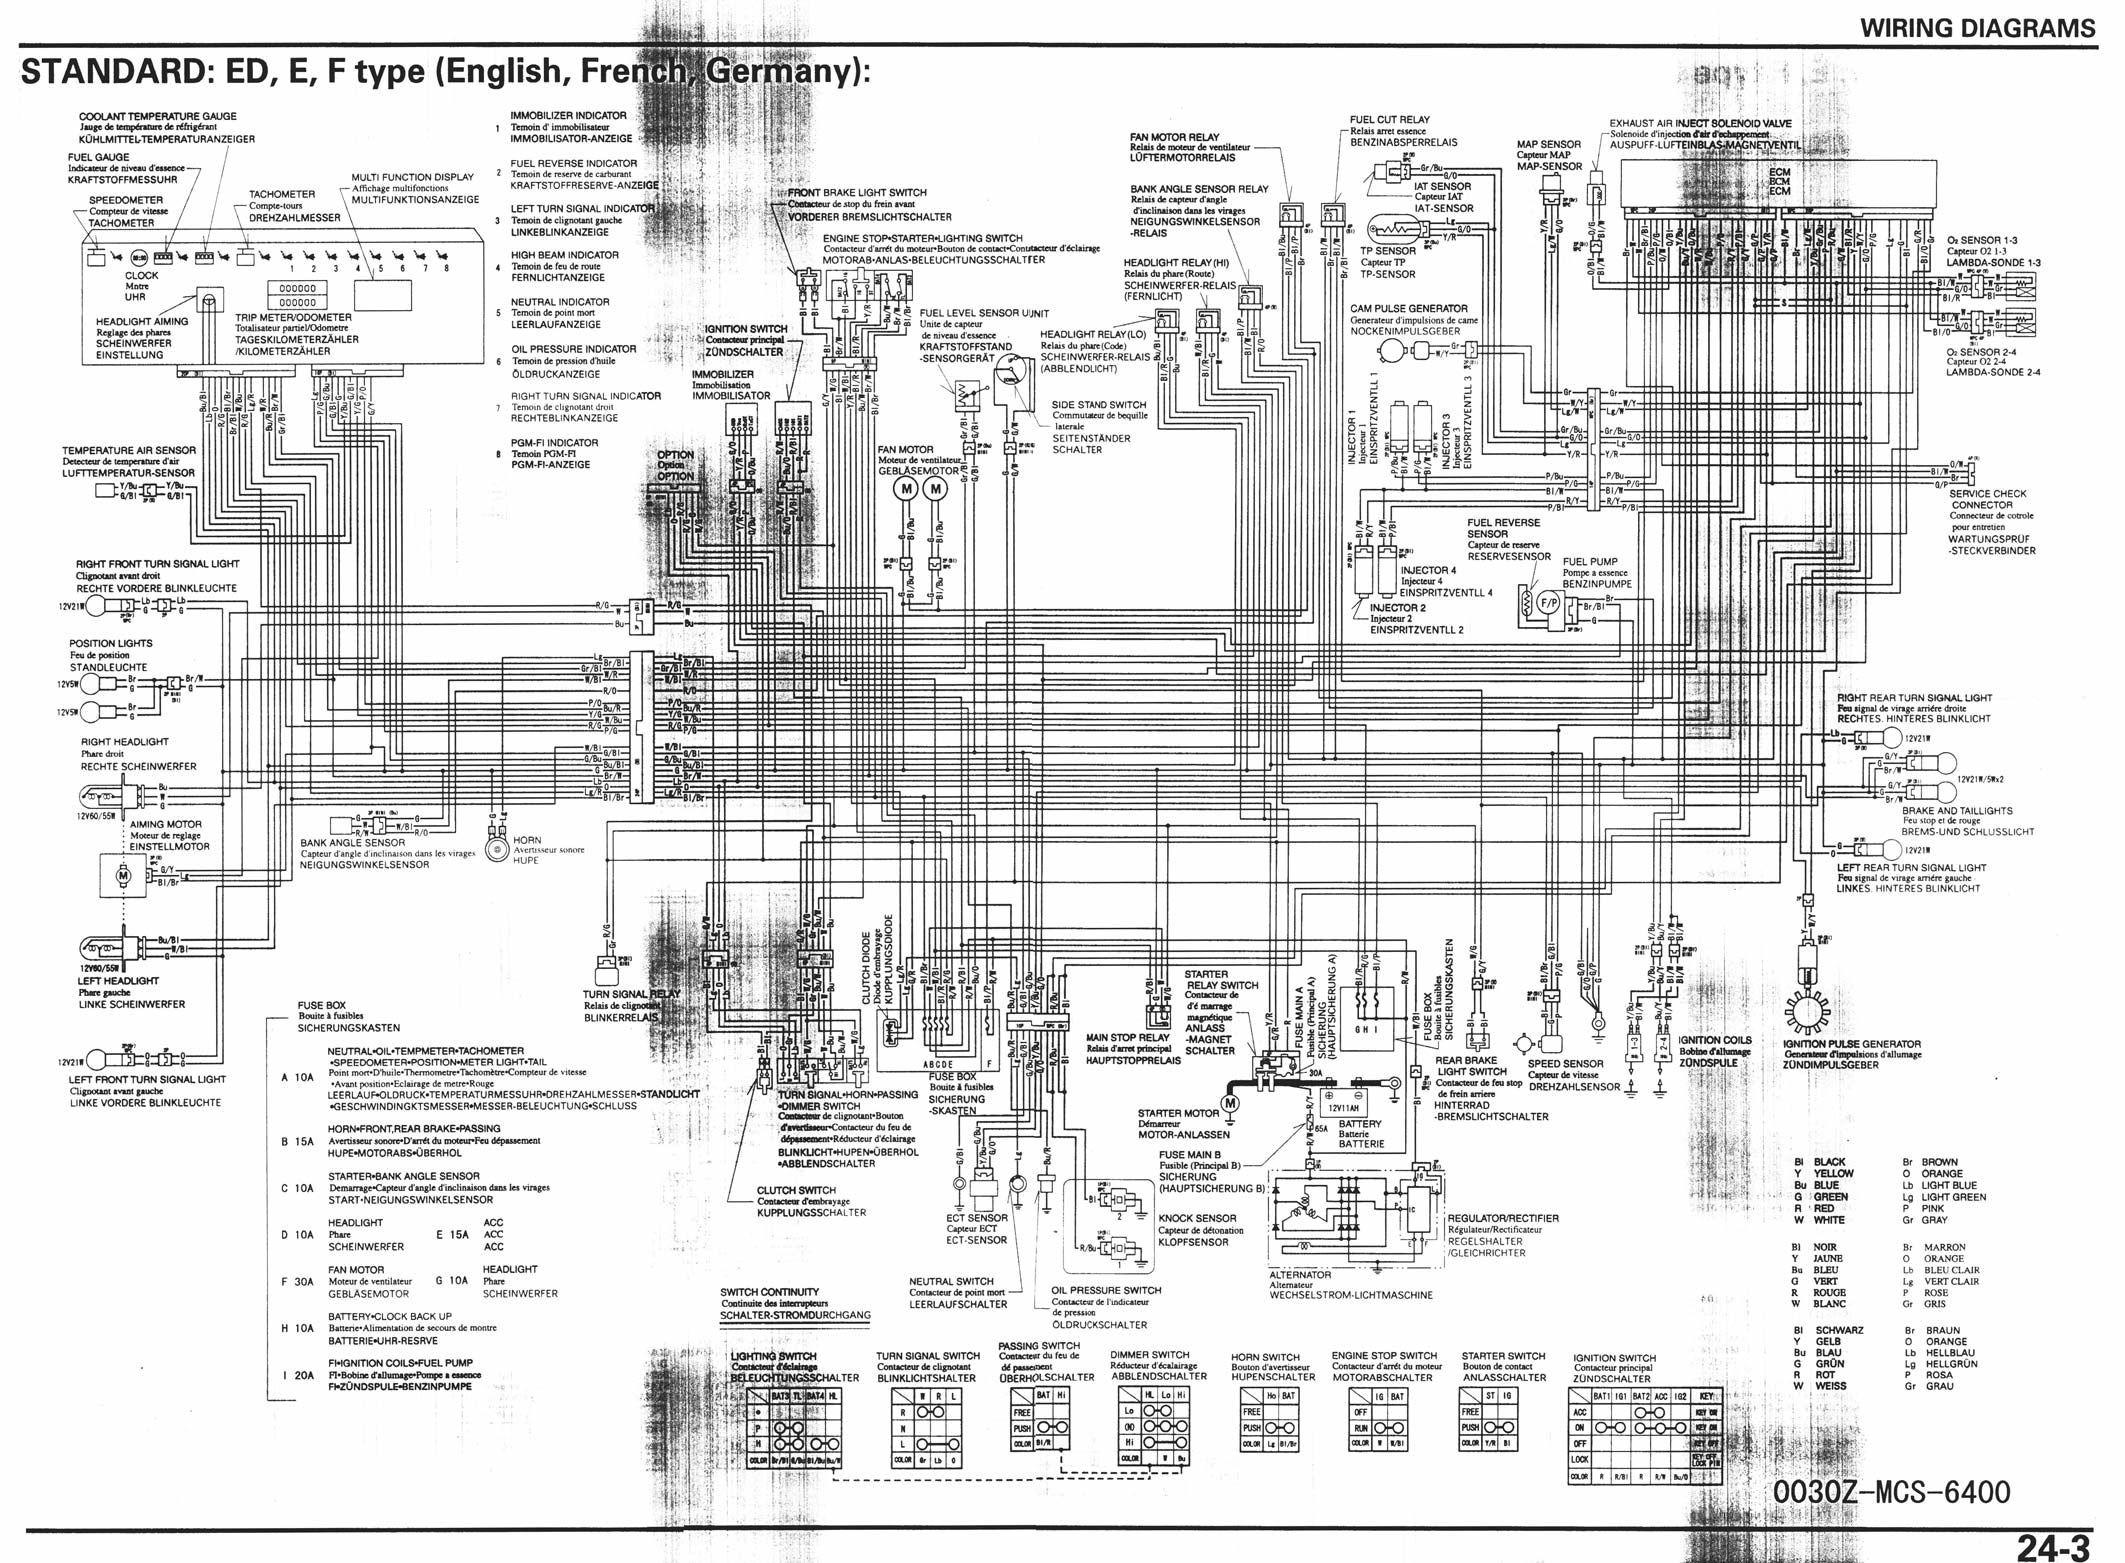 2003 Ram Running Light Schematic Diagram] Bmw F800gs Wiring Diagram Full Version Hd Quality Of 2003 Ram Running Light Schematic